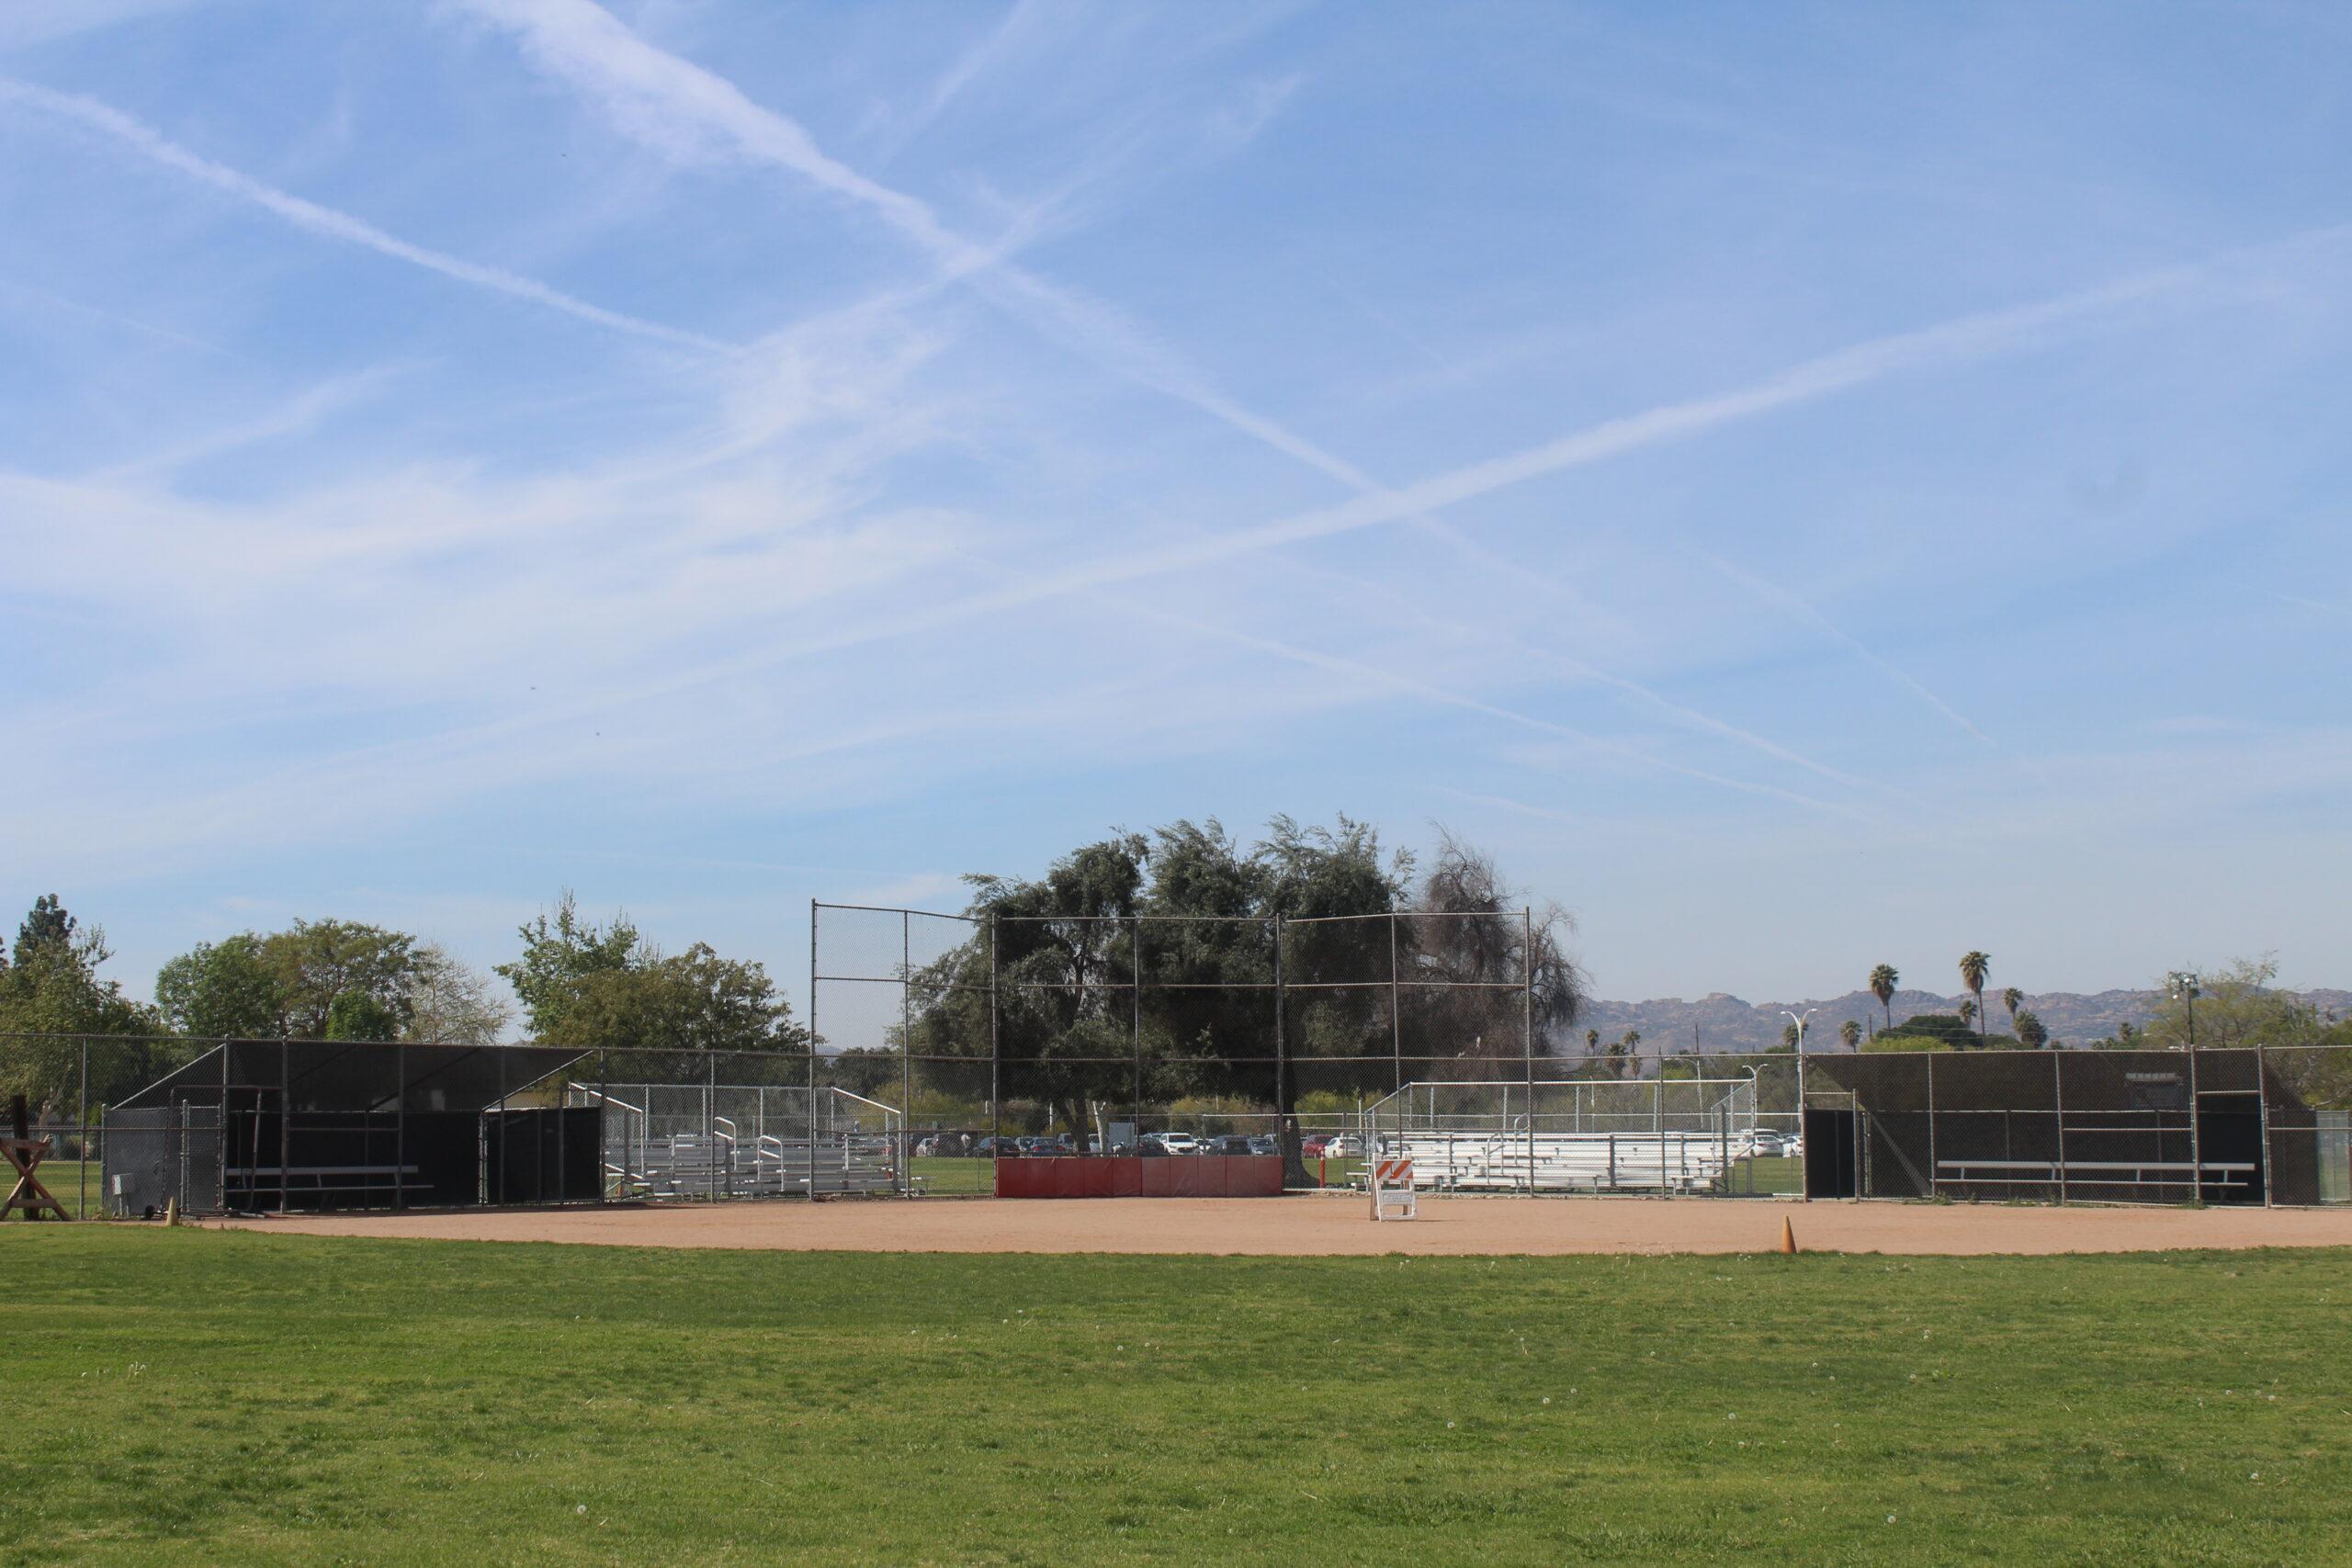 BRIEF: Softball program cancels season